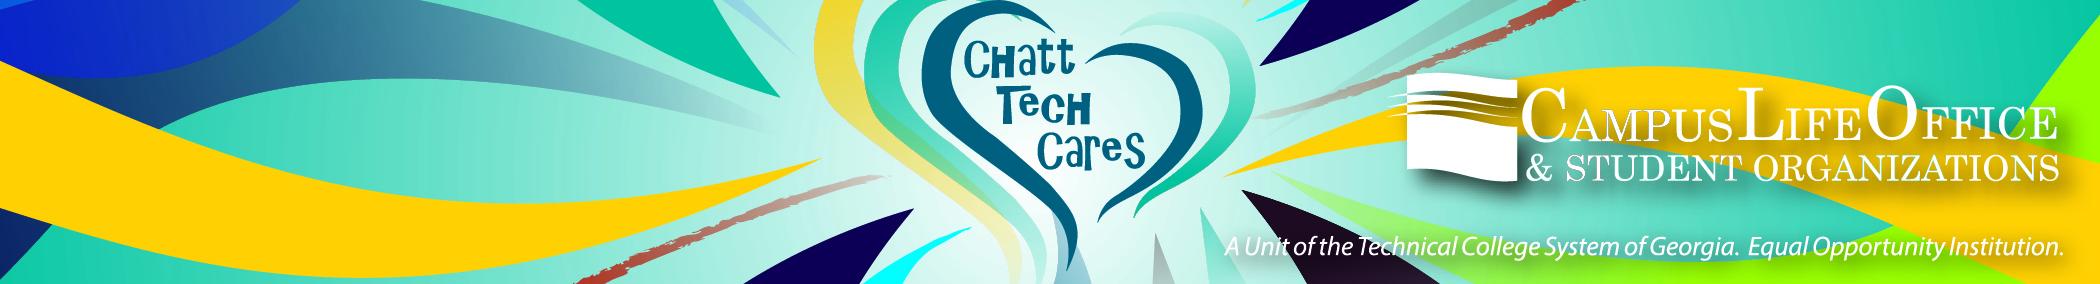 Chatt+Tech+Cares+Logo